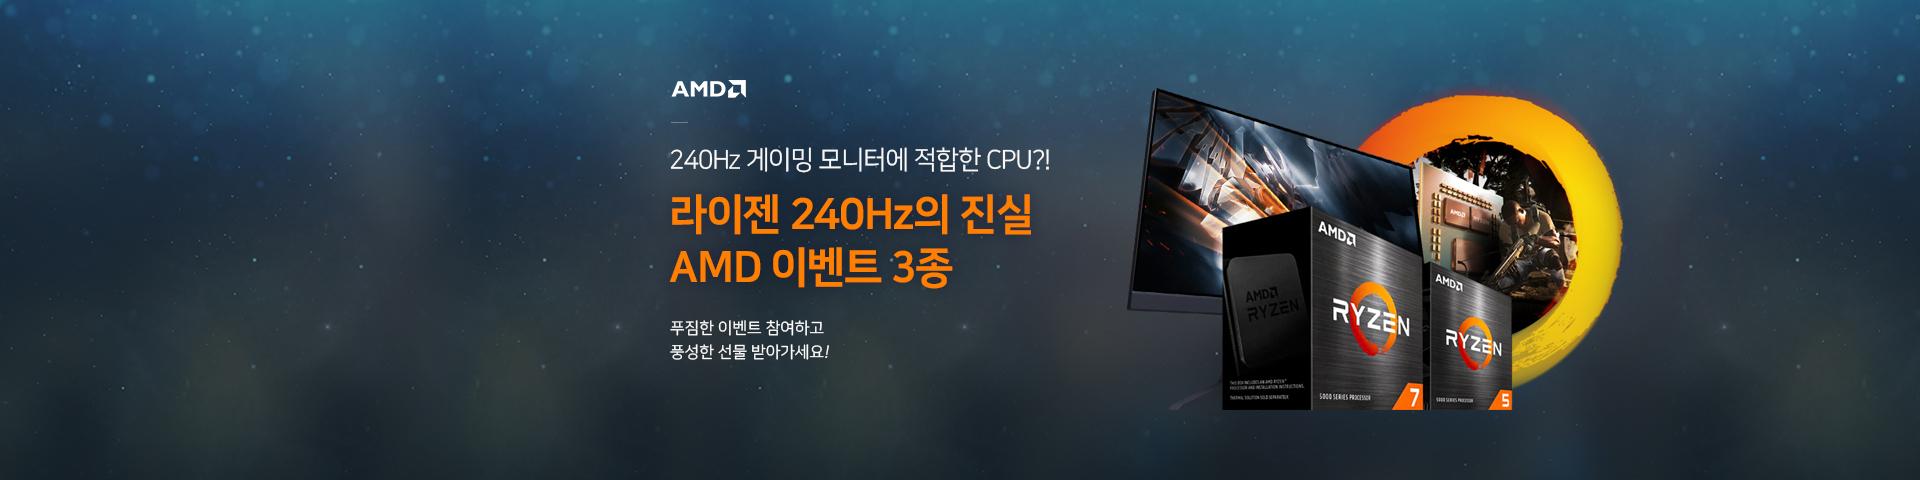 [AMD] 라이젠240Hz의진실